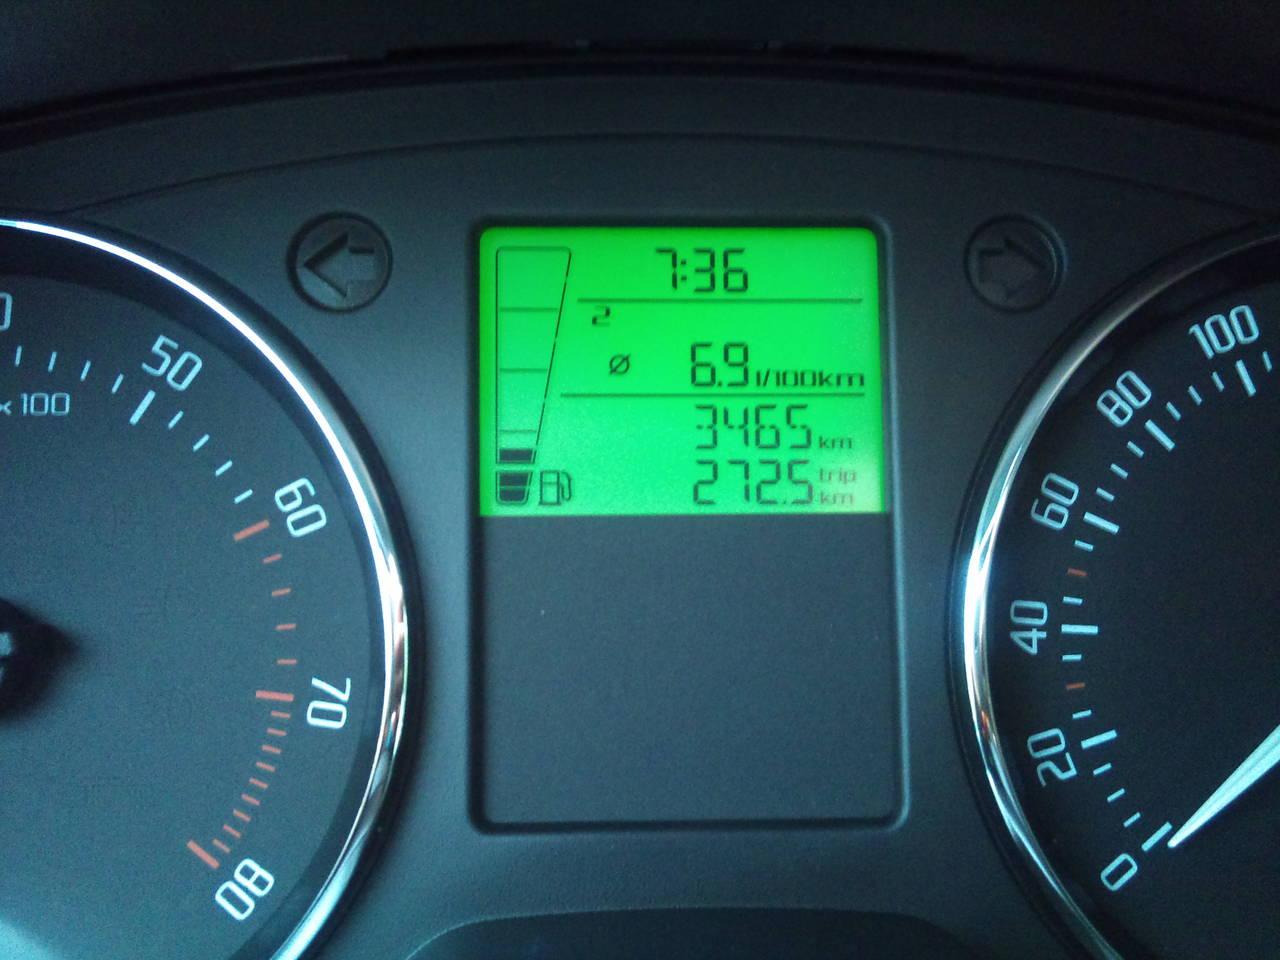 skoda fabia 1.2 обороты двигателя при скорости